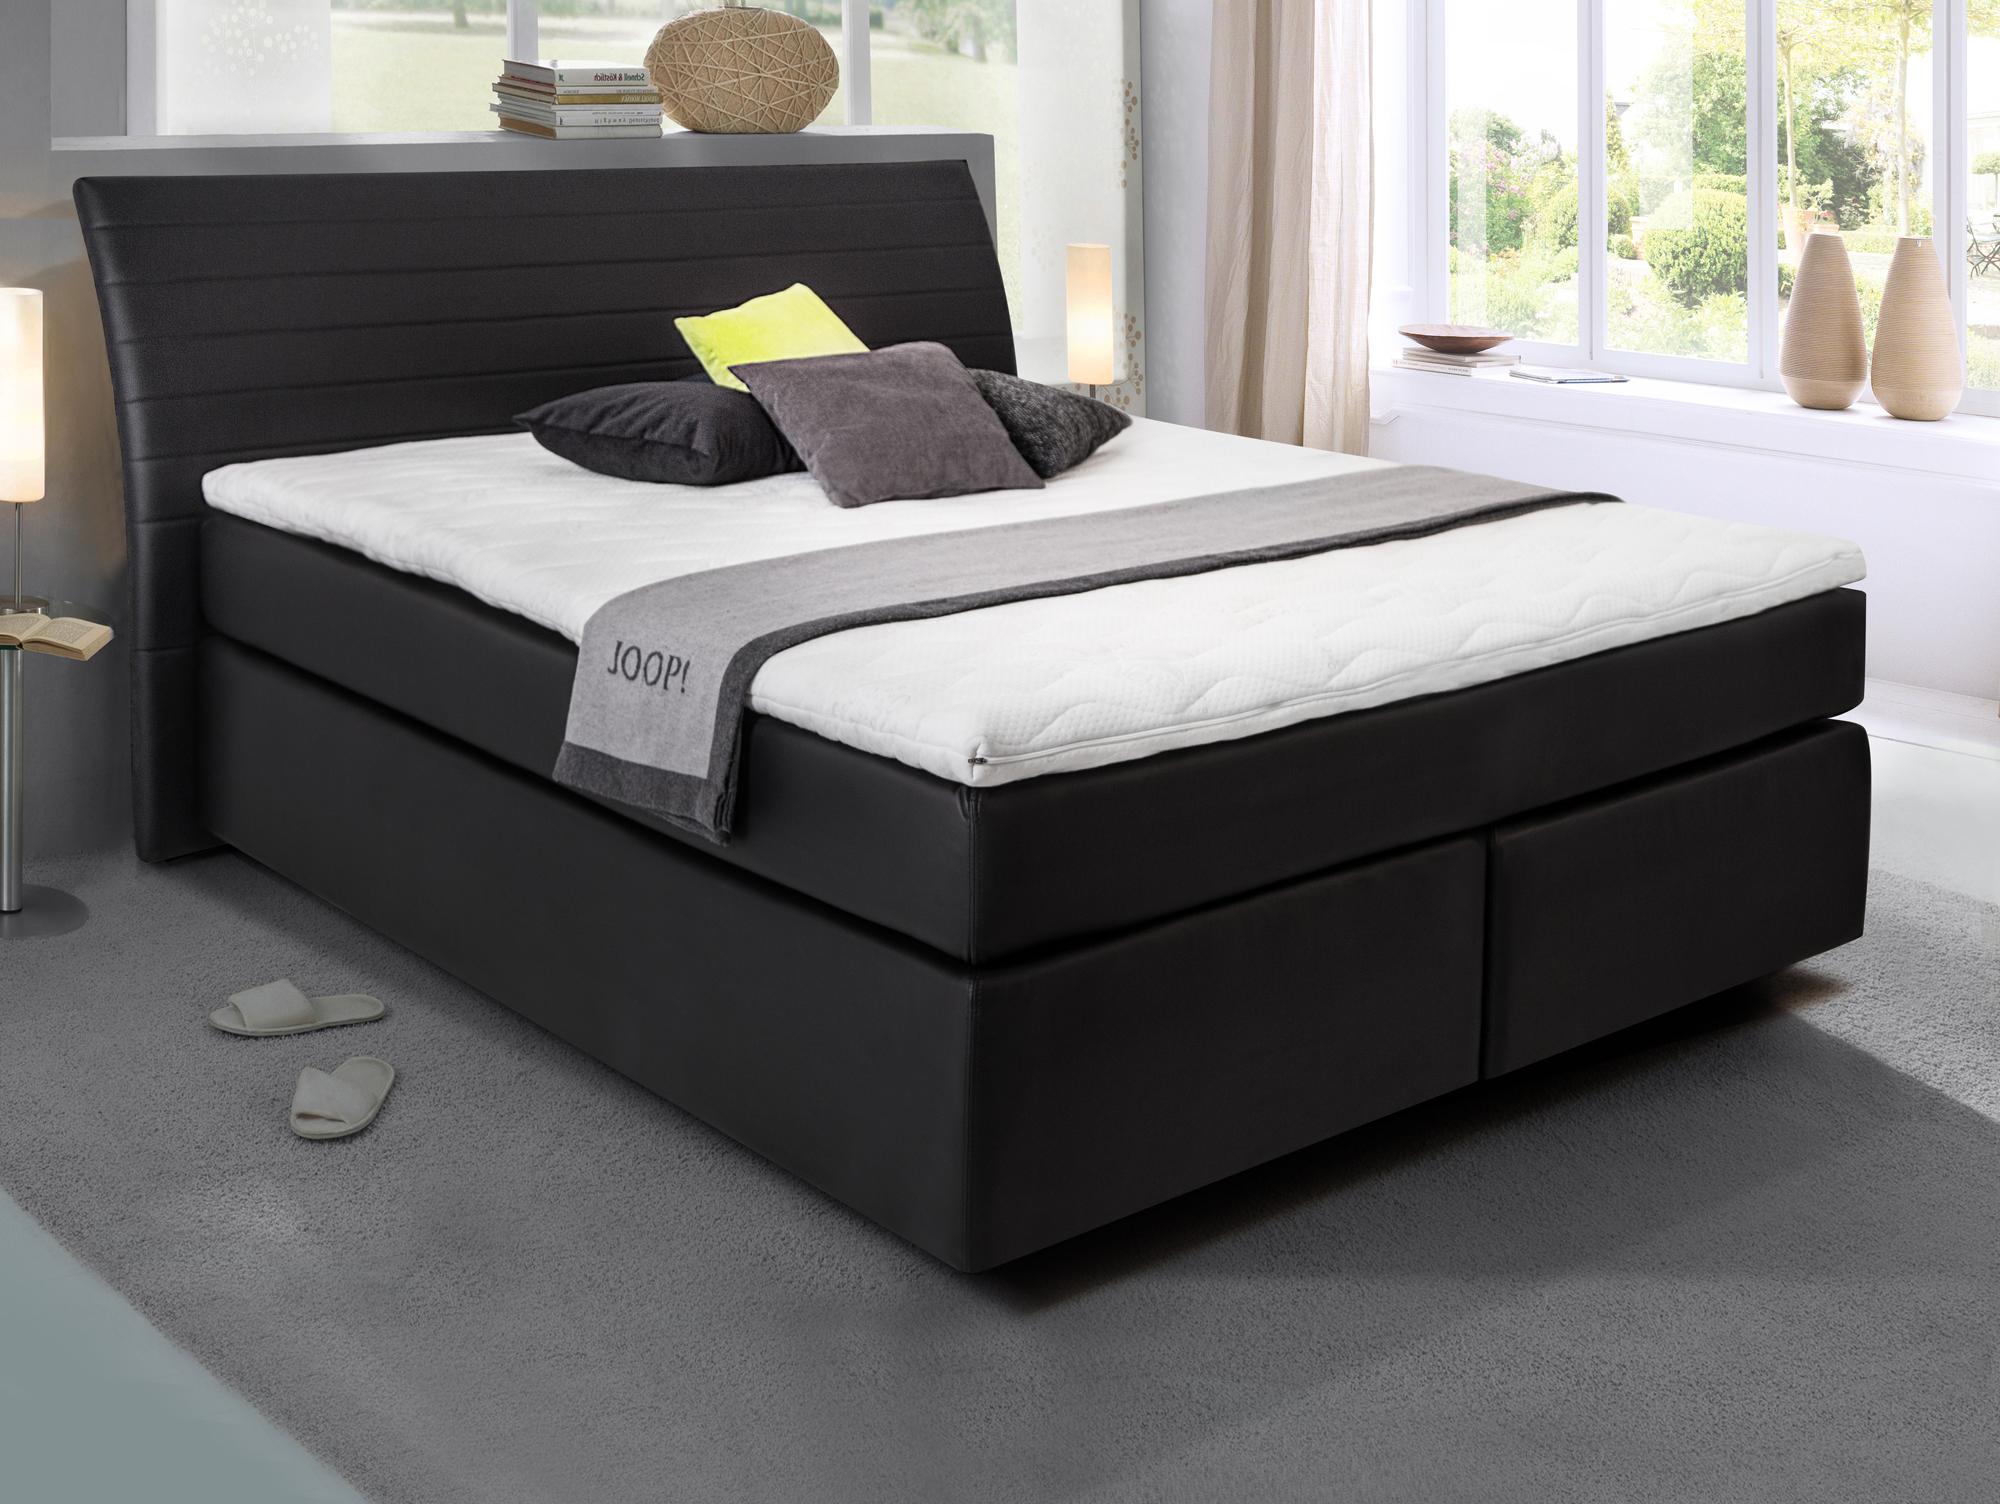 heaven boxspringbett kunstlederbezug 160 x 200 cm. Black Bedroom Furniture Sets. Home Design Ideas